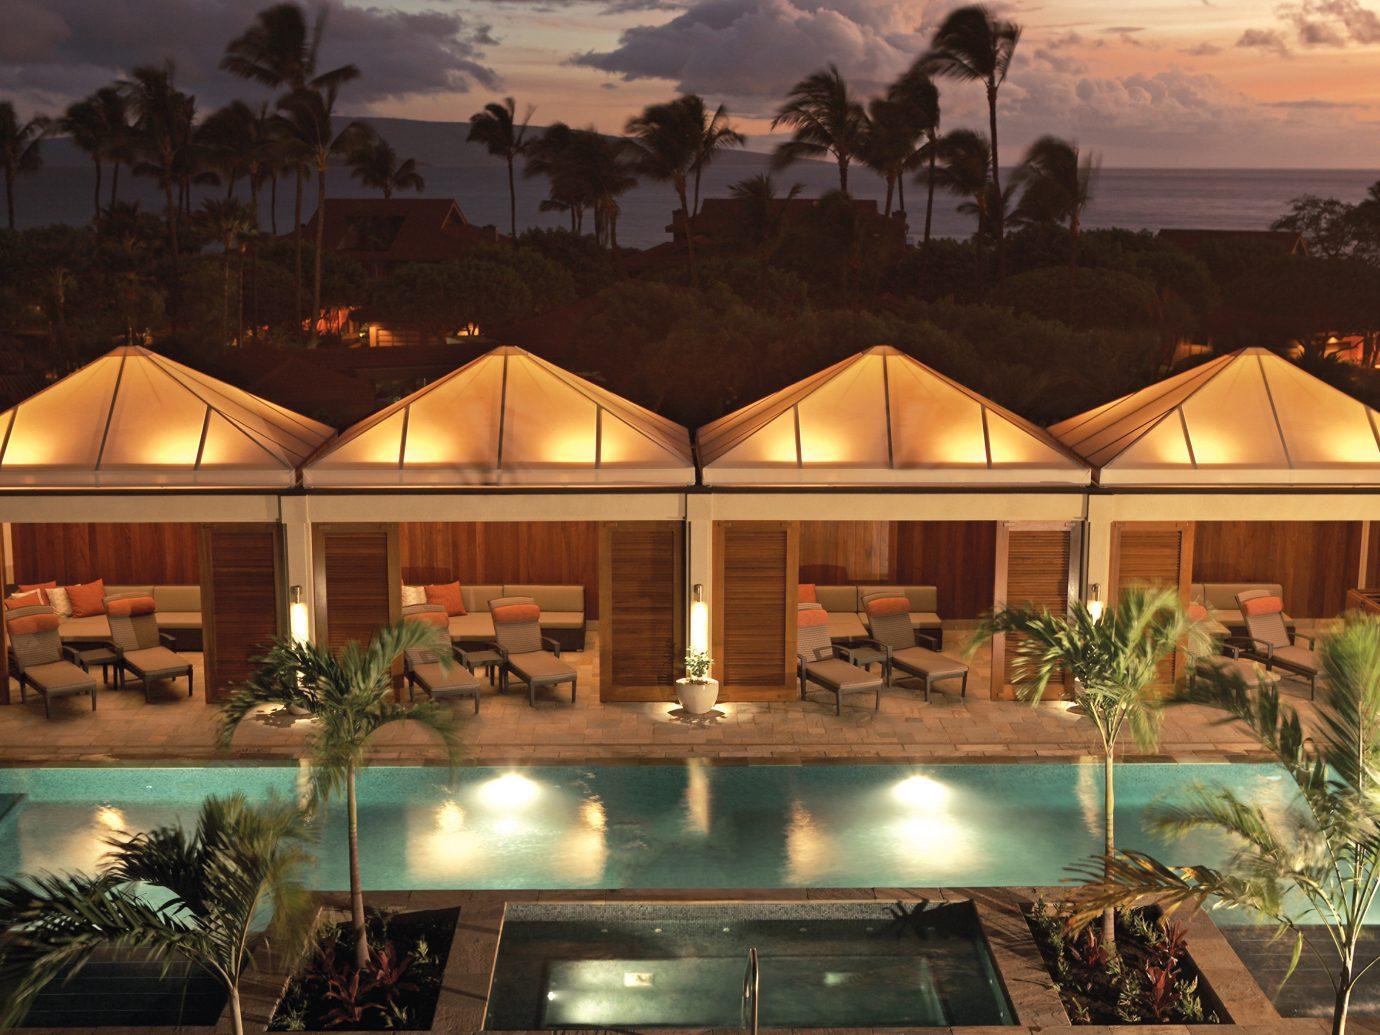 Hotels Island Lounge Patio Pool Romance Tropical outdoor light estate Resort lighting home